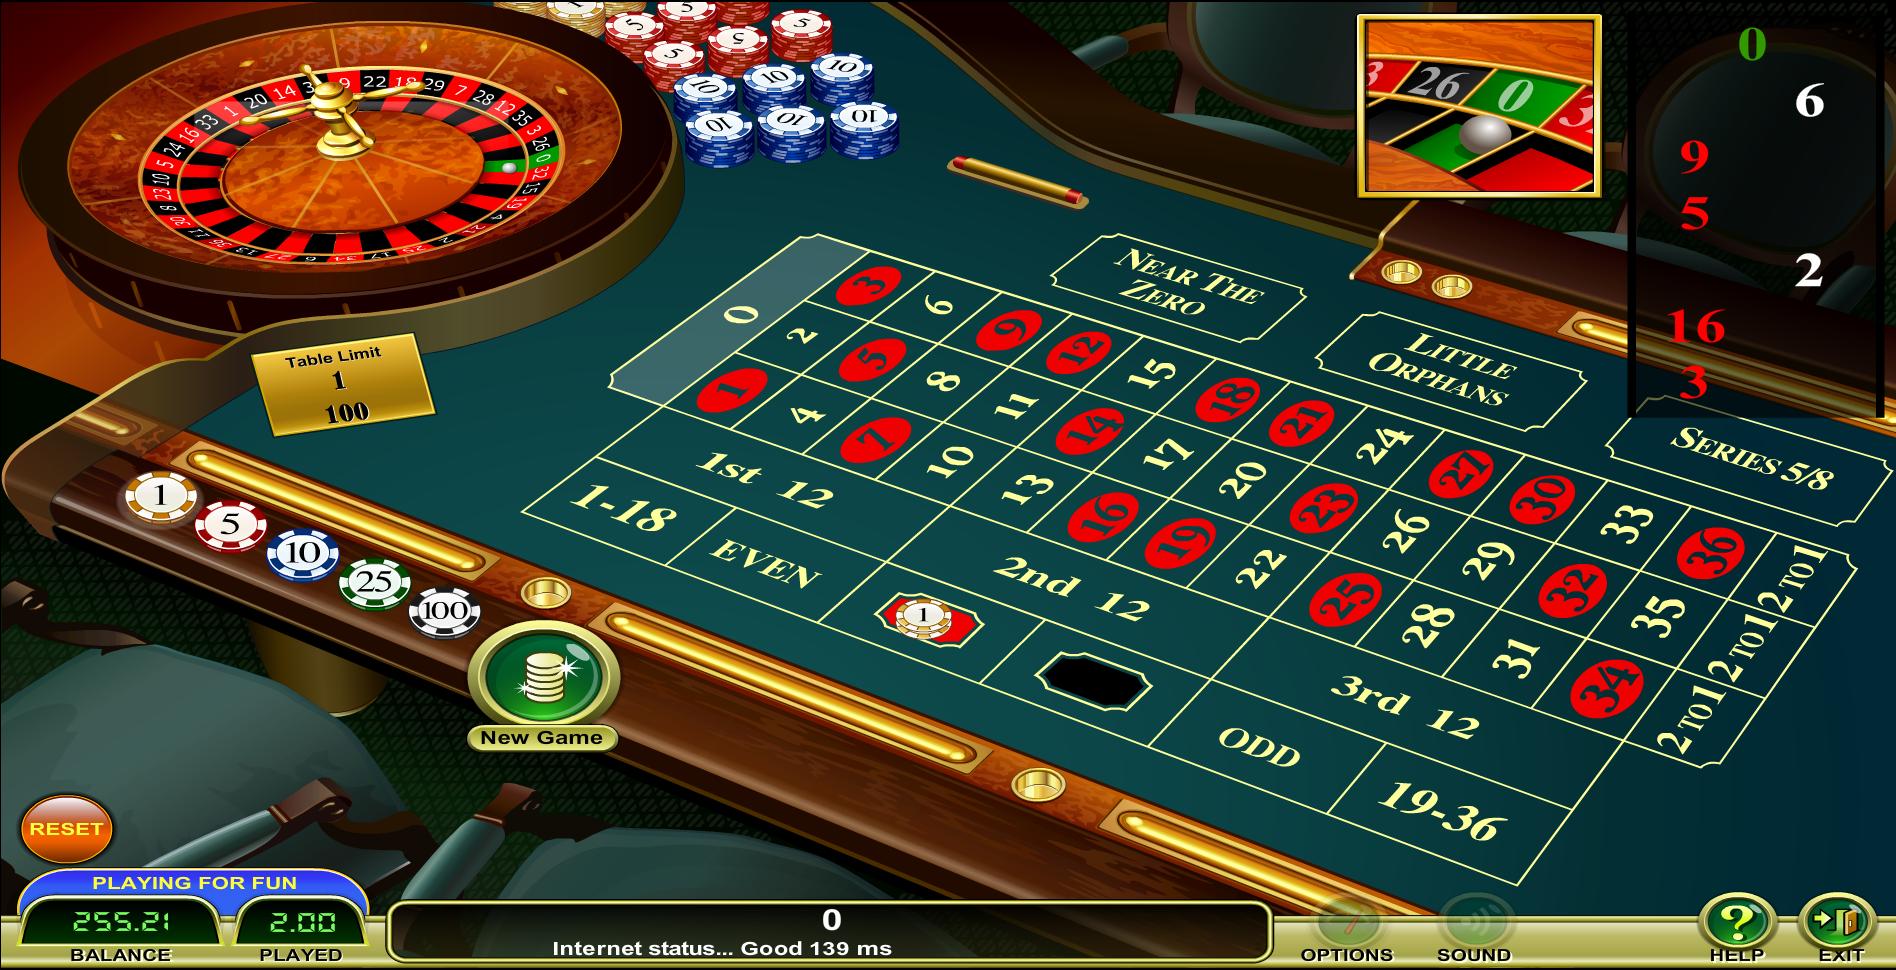 Casino table game manufacturers 3-5-7 california grand casino poker tournament